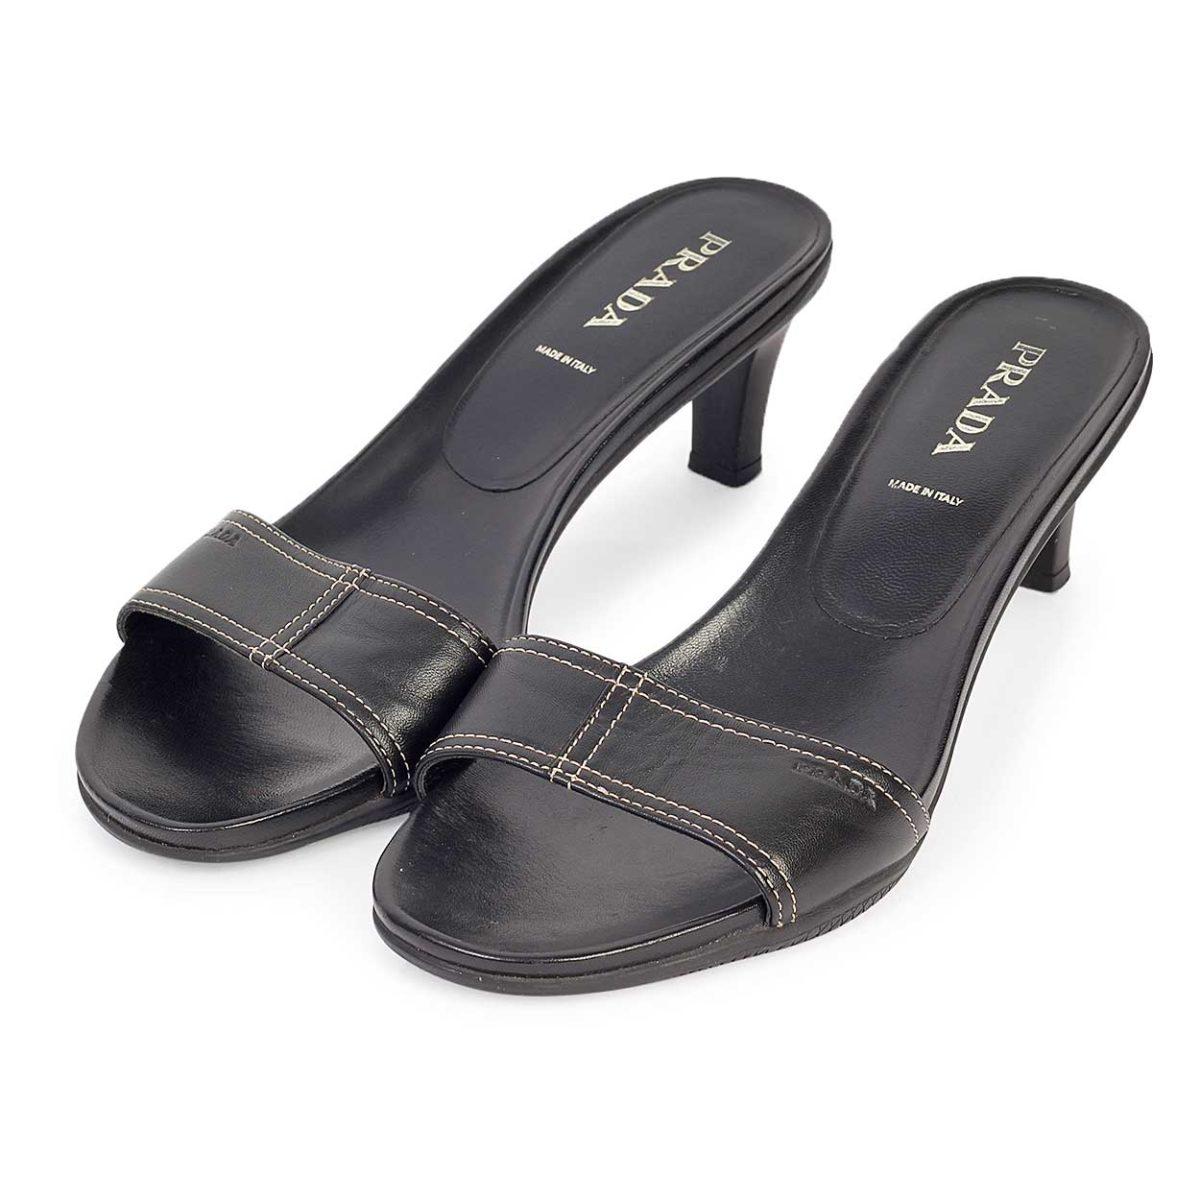 5e76eb2b741 PRADA Leather Kitten Heel Sandals Black - S  39 (6)